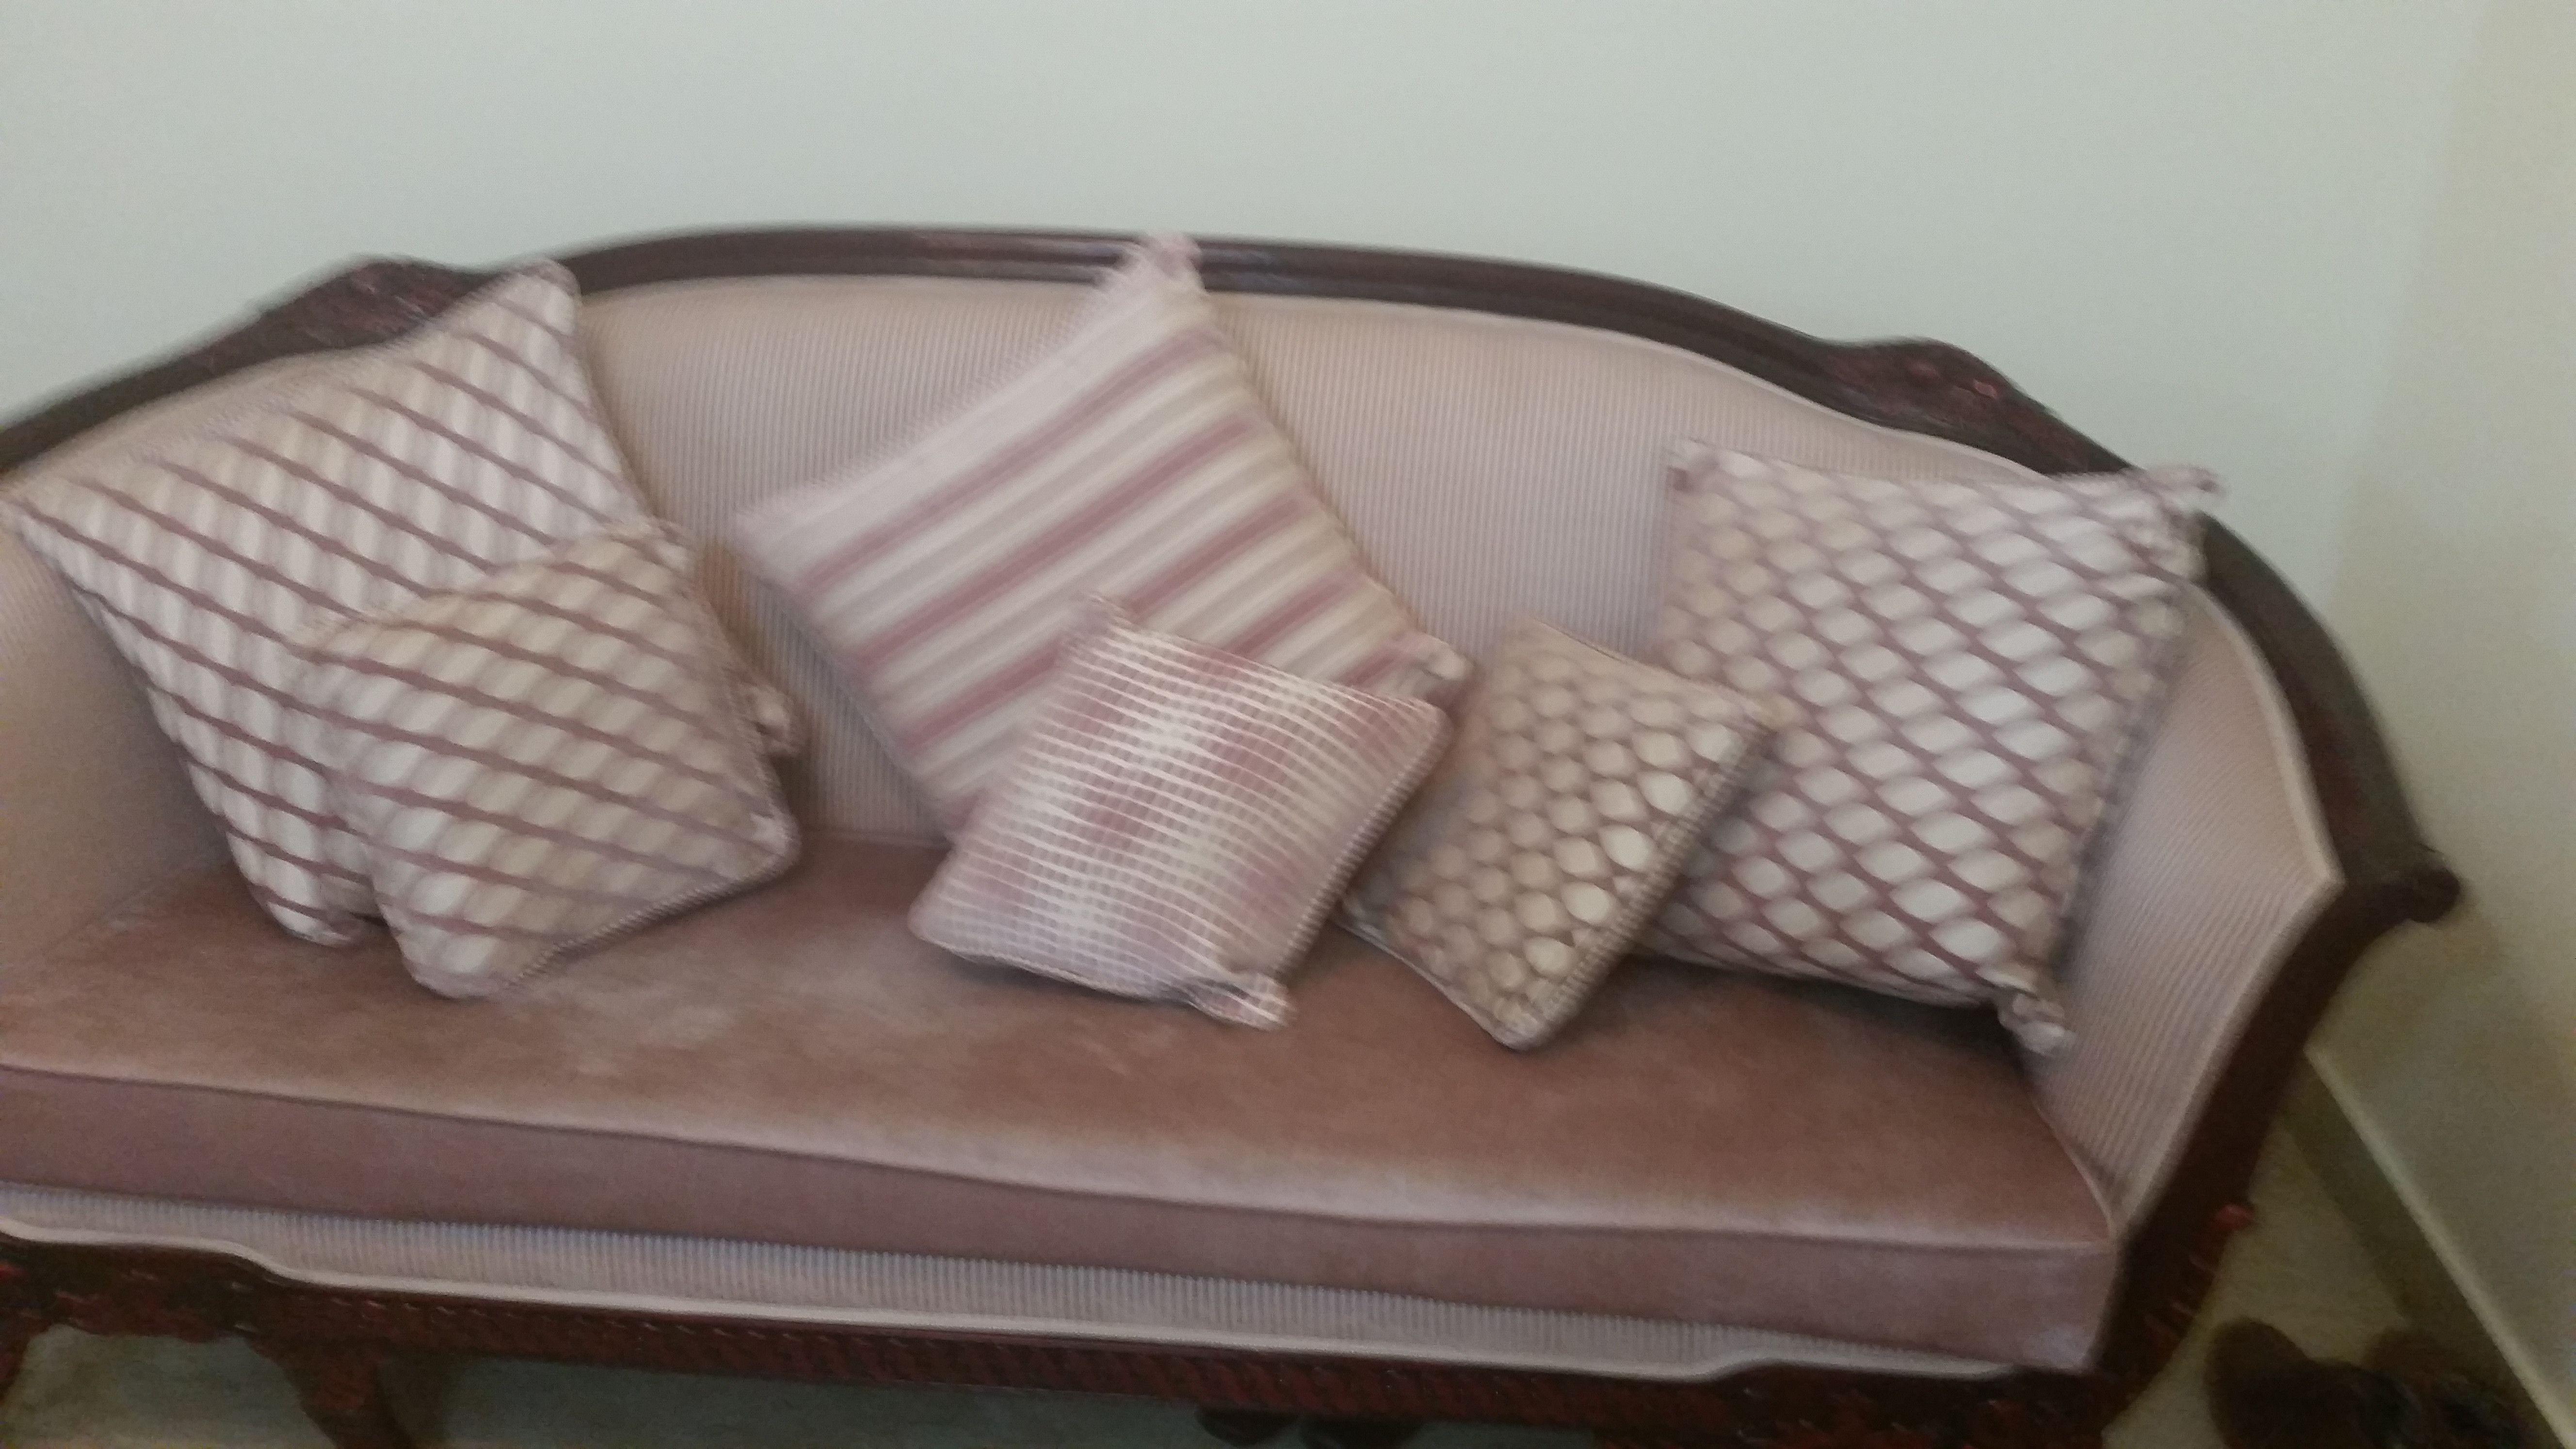 House Furniture For Sale In Abu Dhabi Al Dhafrah Abu Dhabi Uae Storat